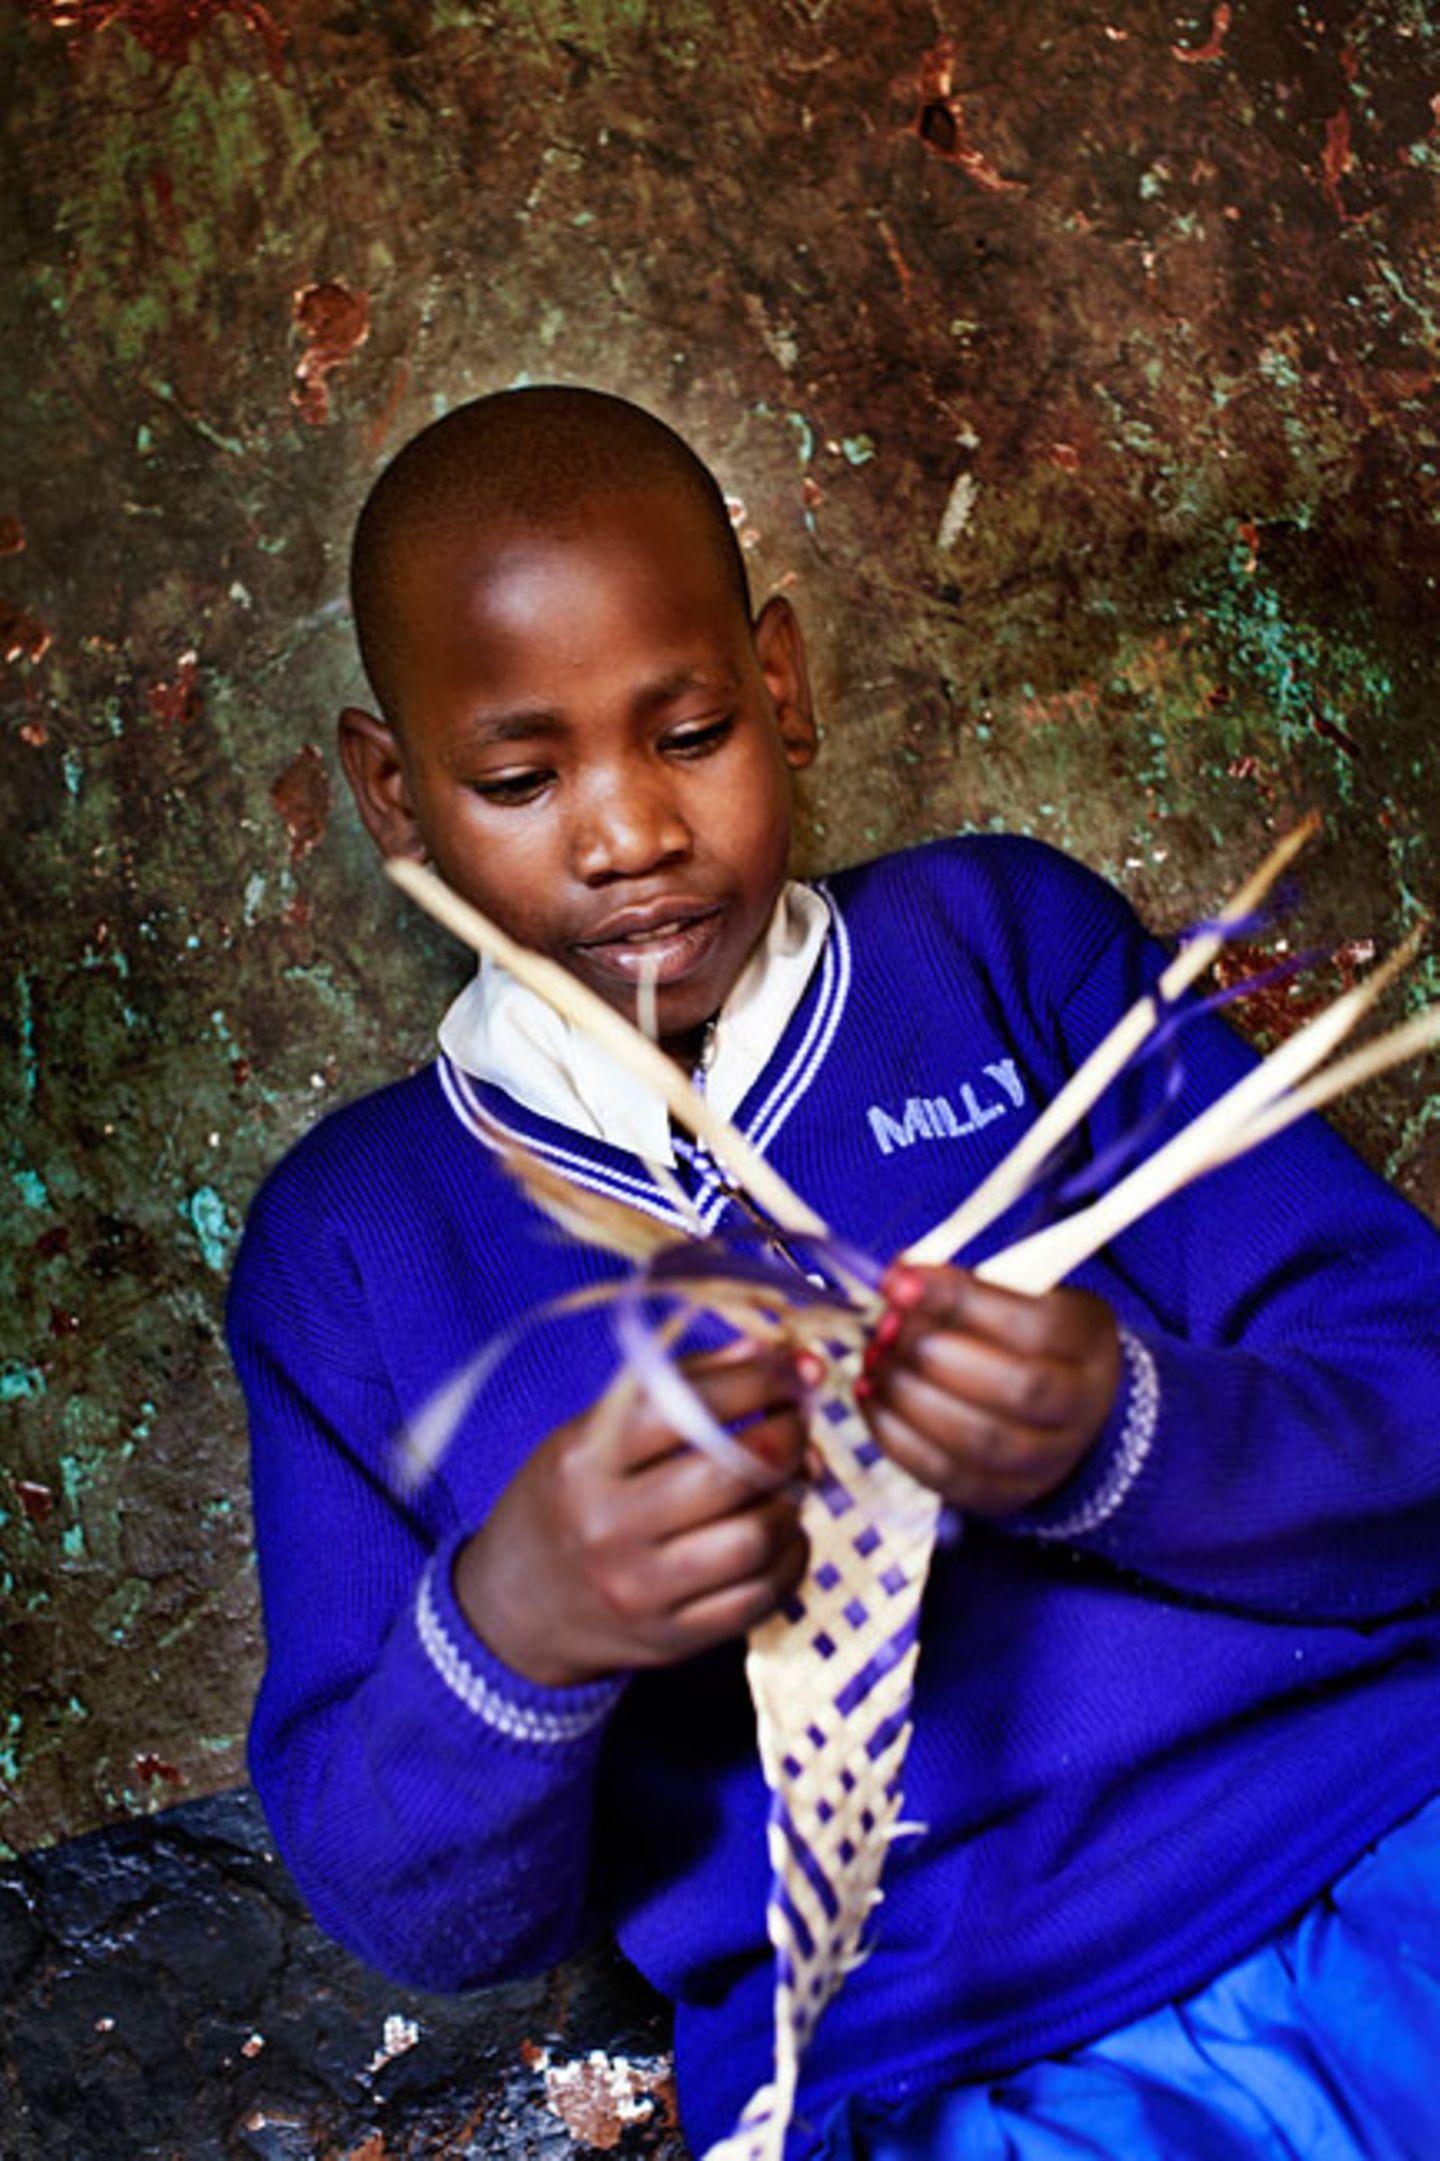 Fotostrecke: Unicef Uganda: Uganda: Victorias zweite Einschulung - Bild 7